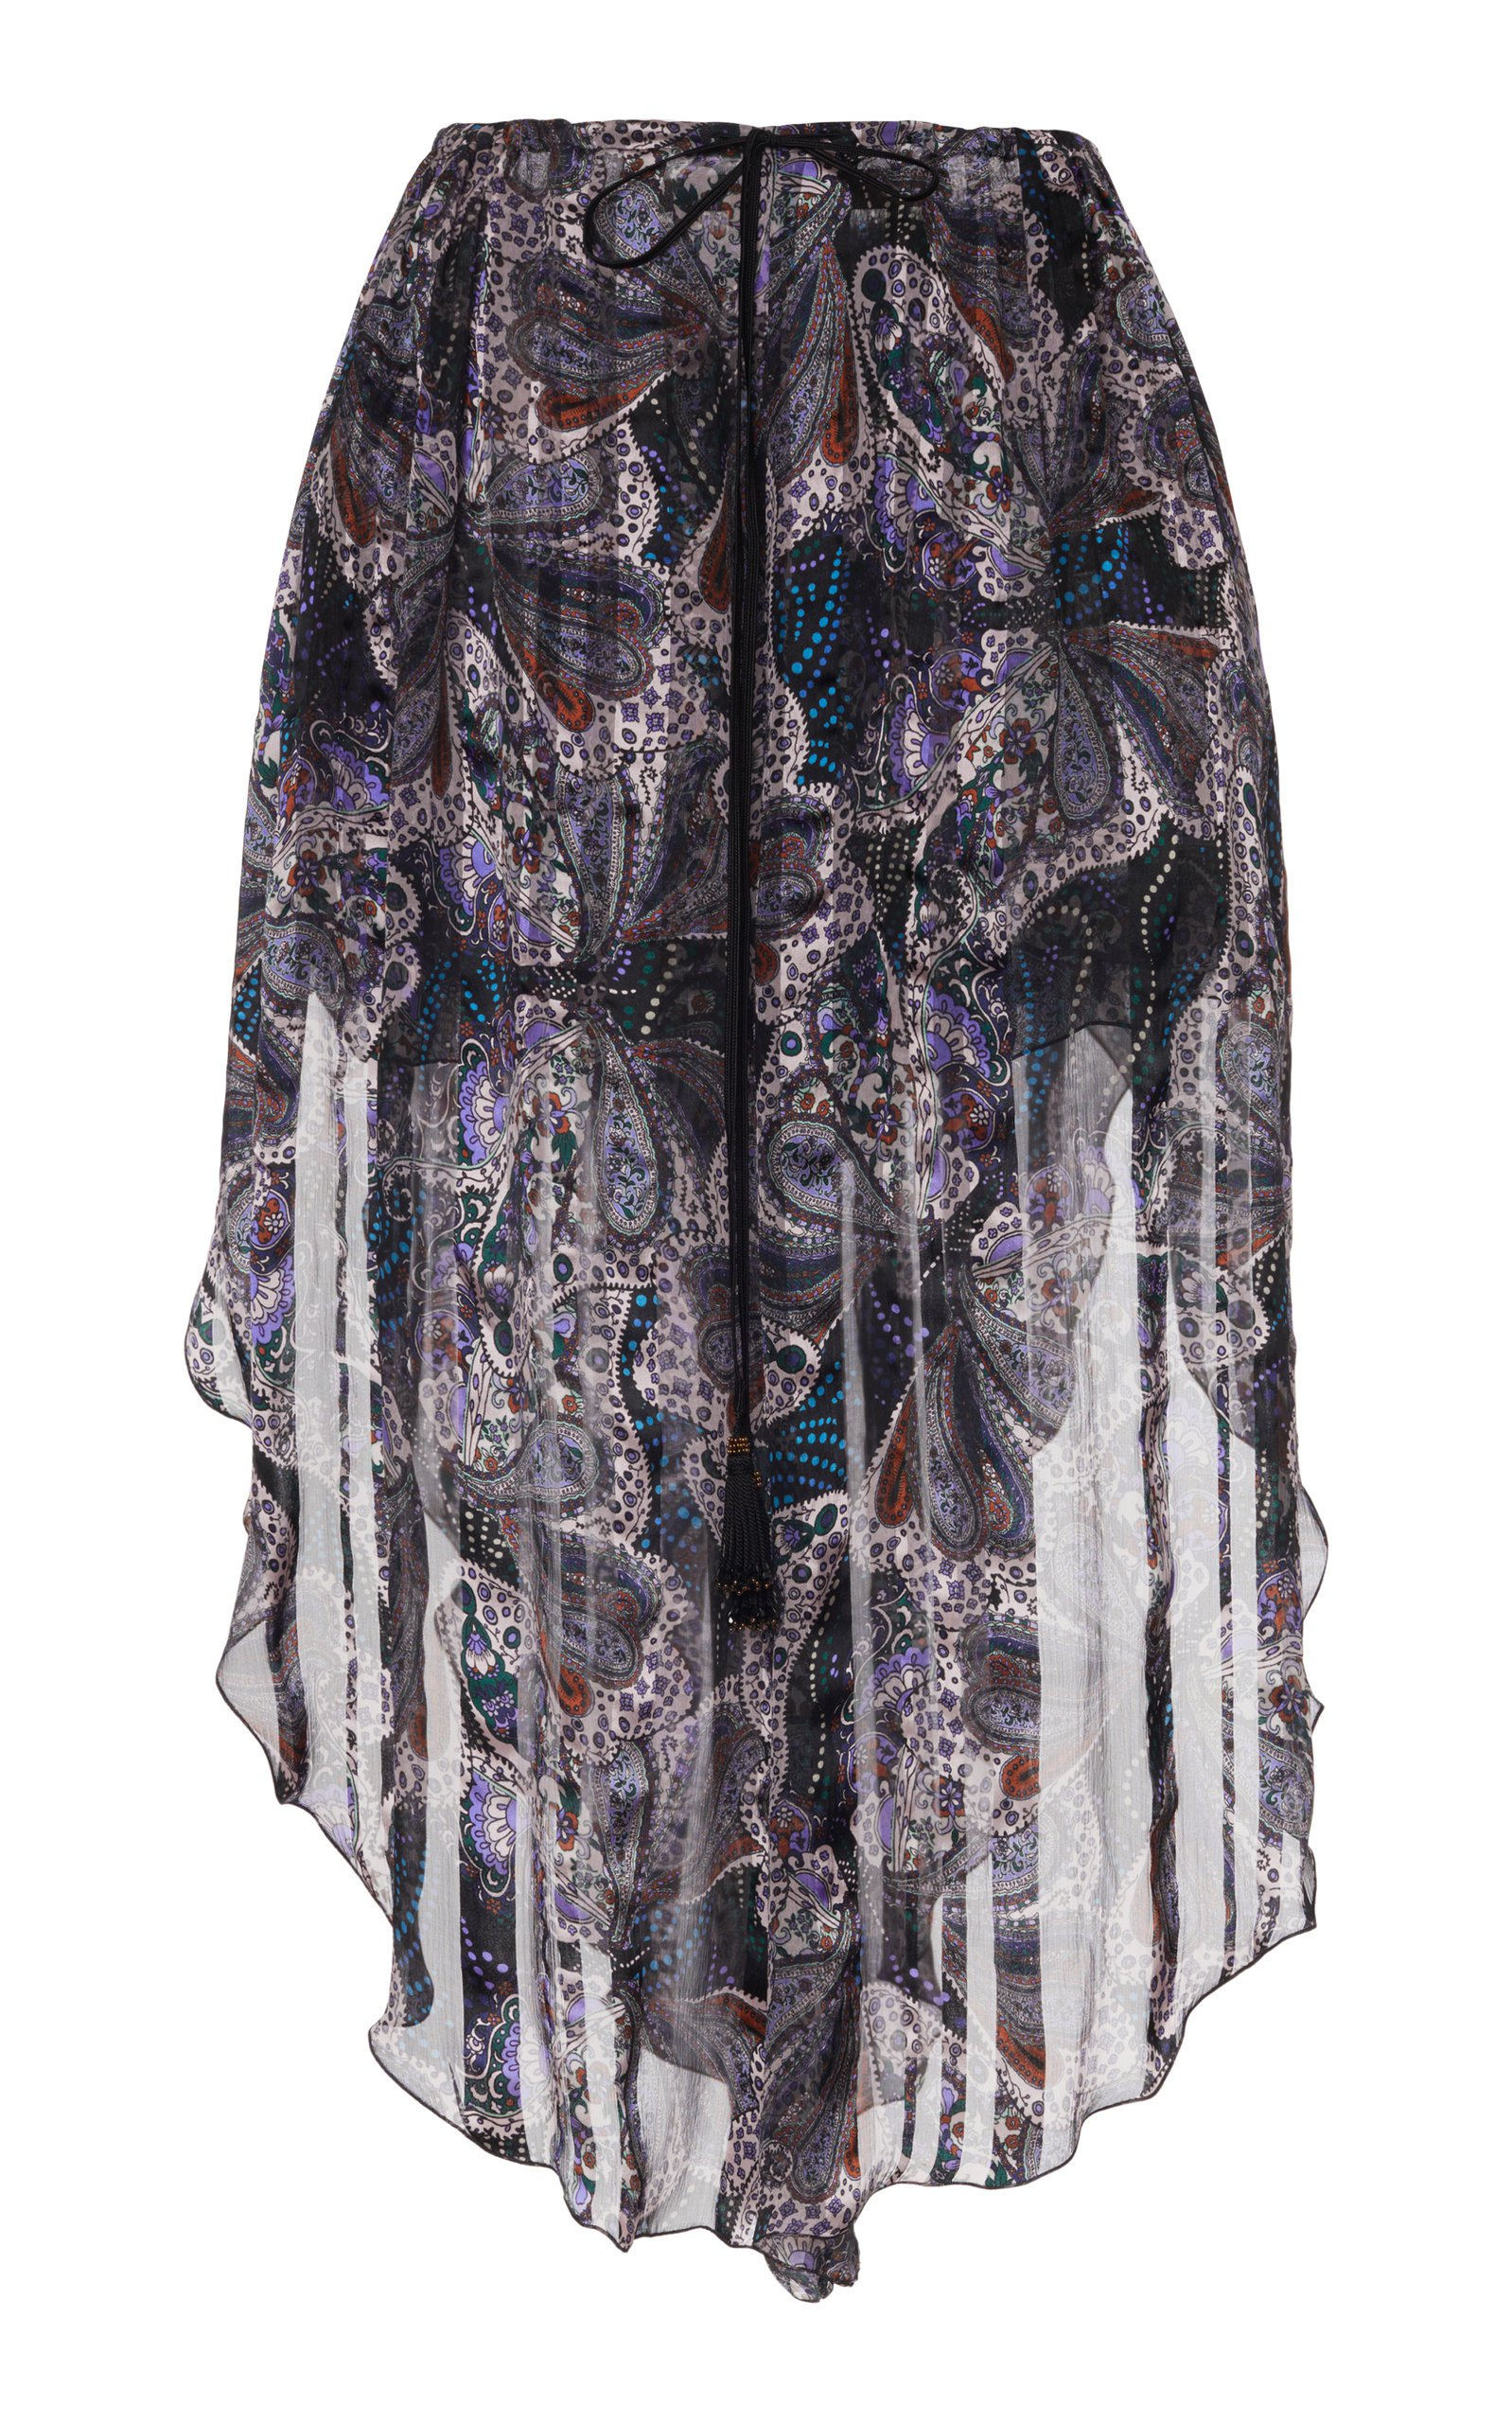 Etro Printed Silk Skirt Size: 46